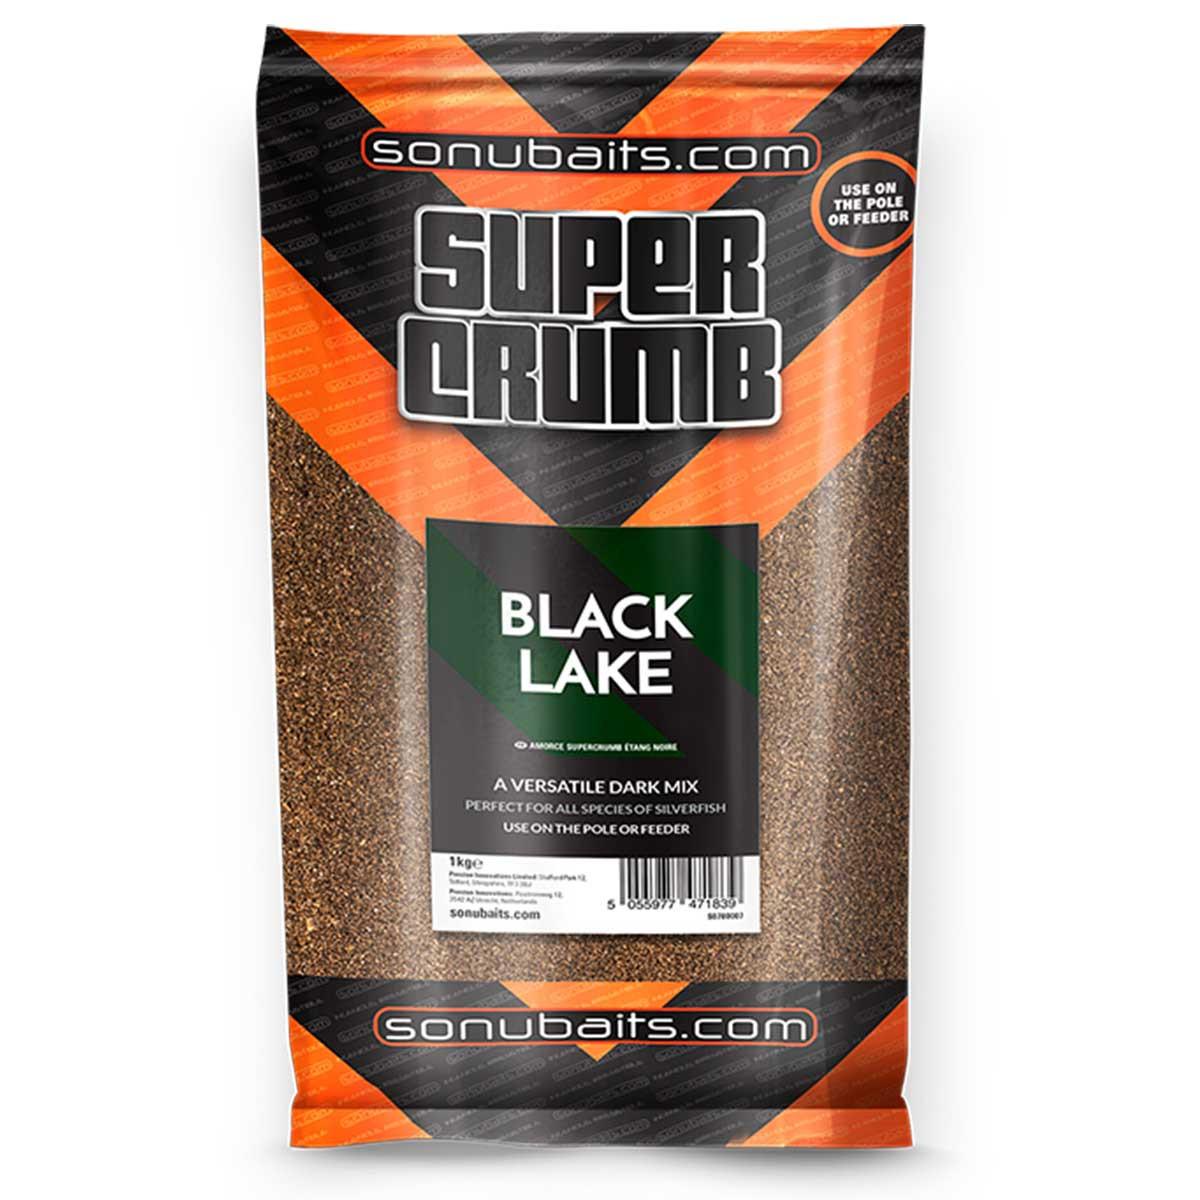 Sonubaits Supercrumb black lake